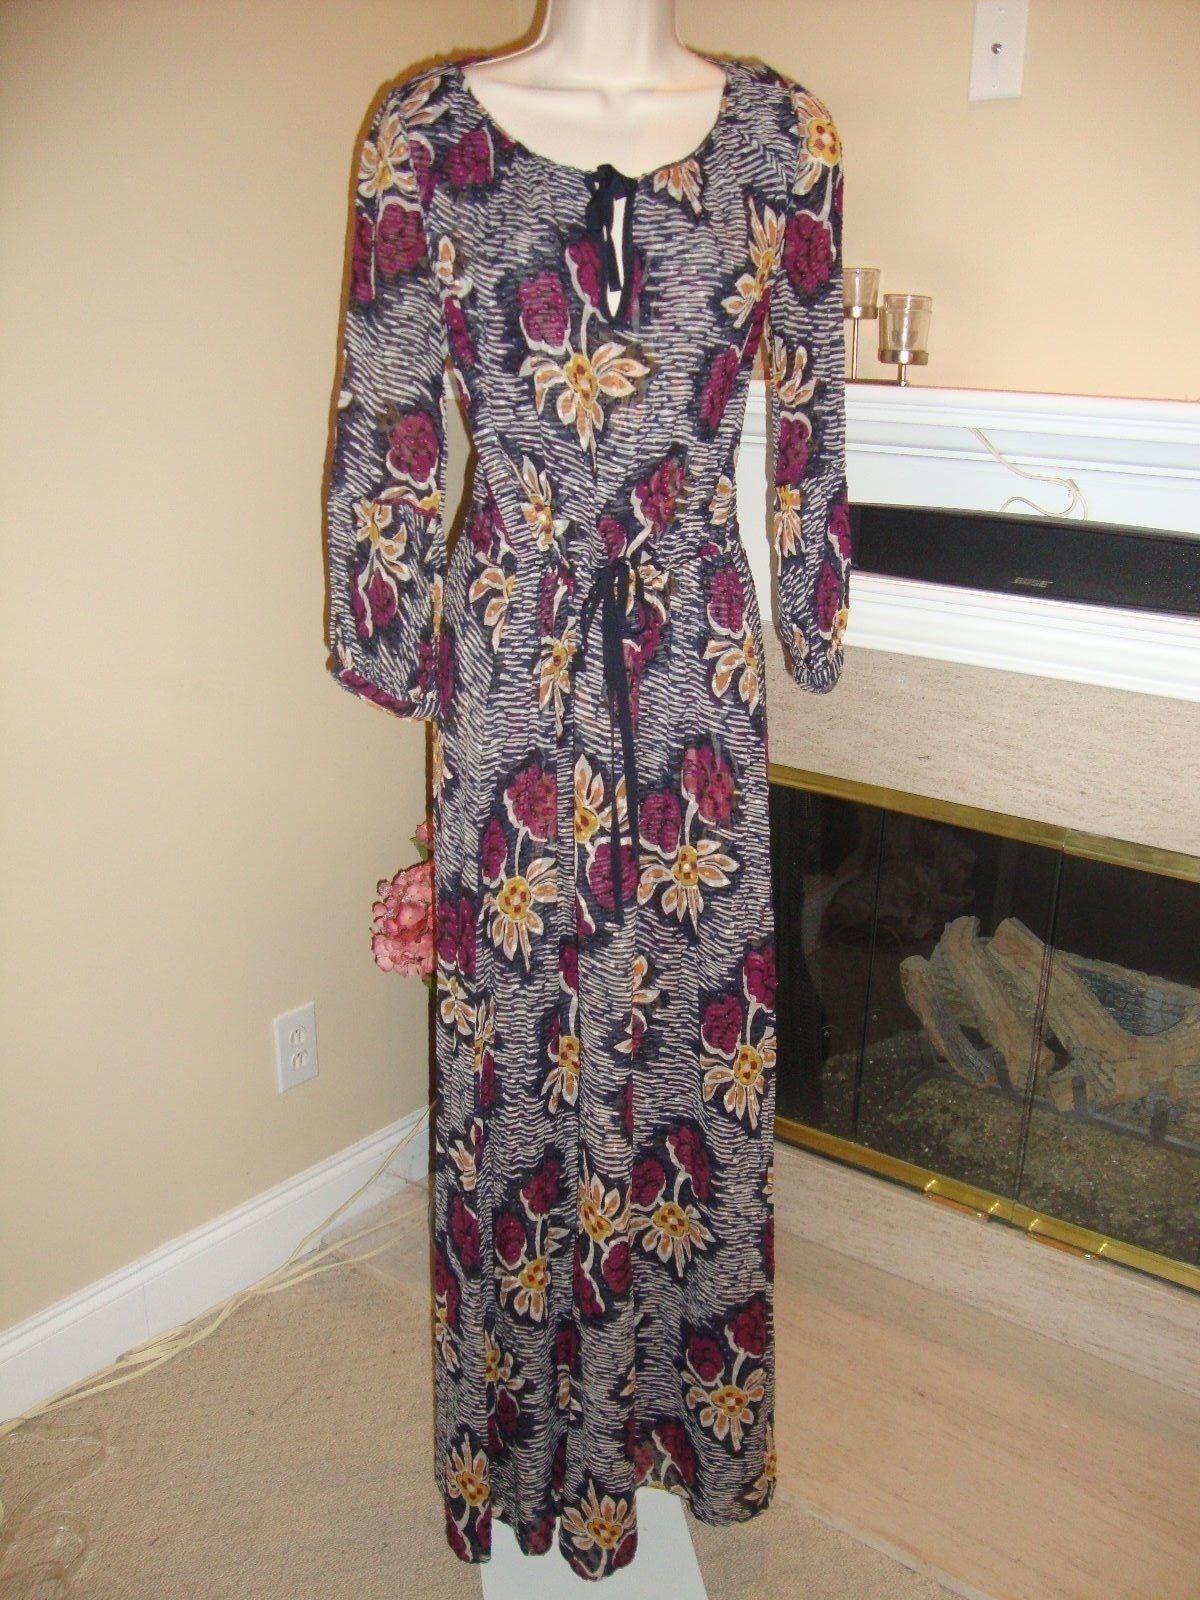 SUPER VERSATILE SOLD OUT  RACHEL PALLY DRESS (NWT)